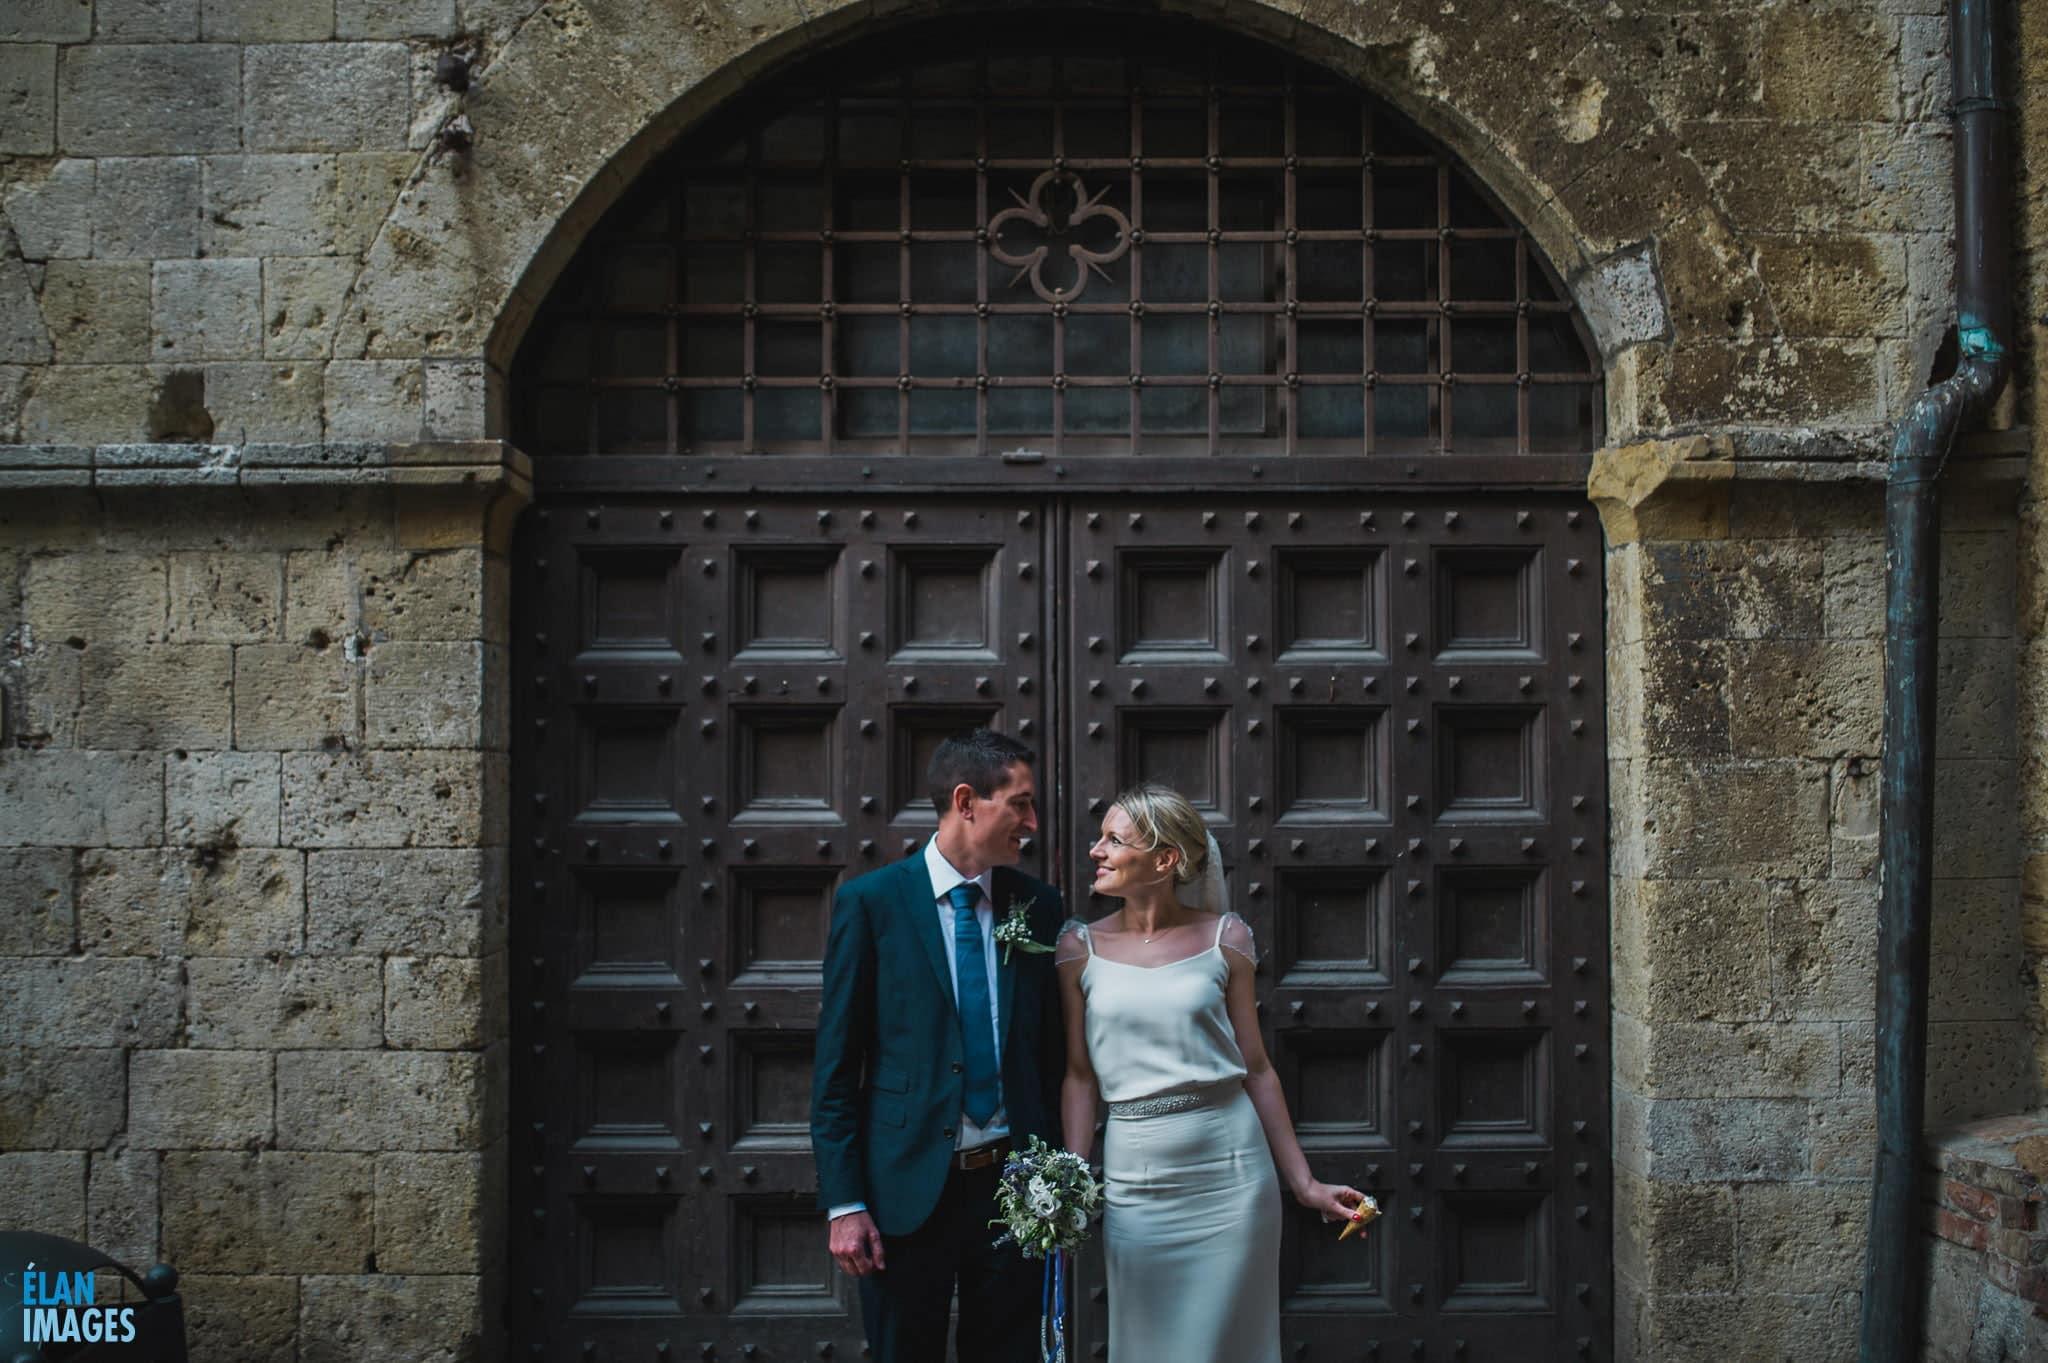 San Gimignano Wedding in Italy 64